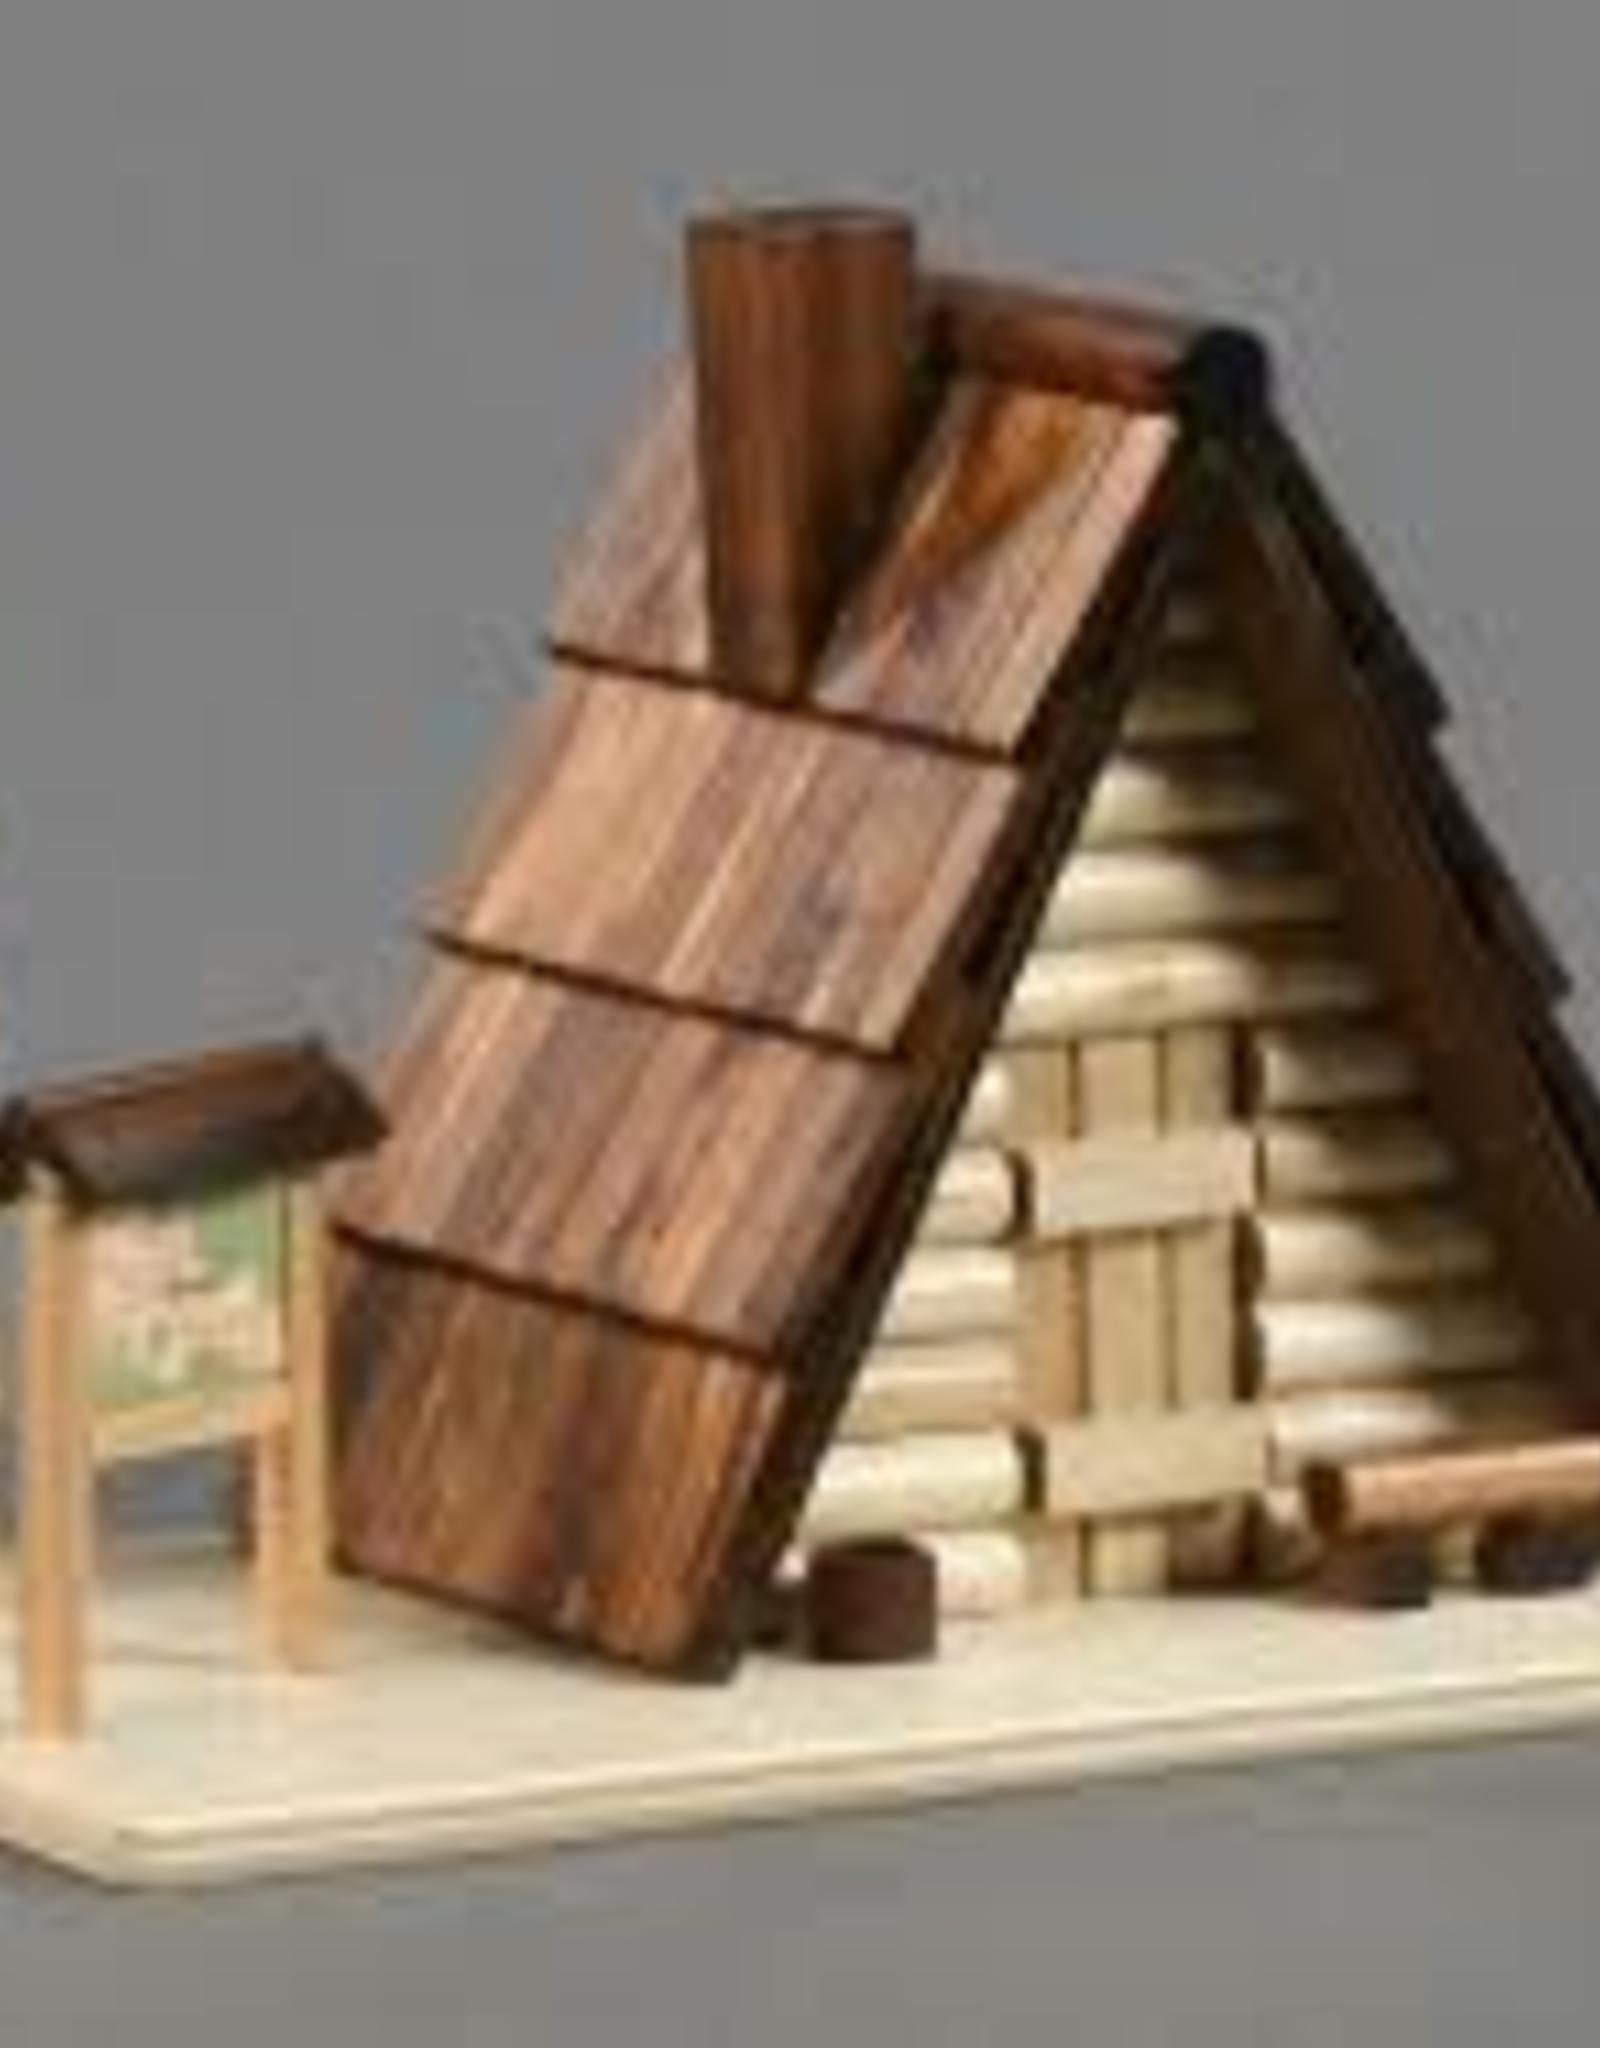 Ski Hut Smoking (Incense) House 12cm x 17cm